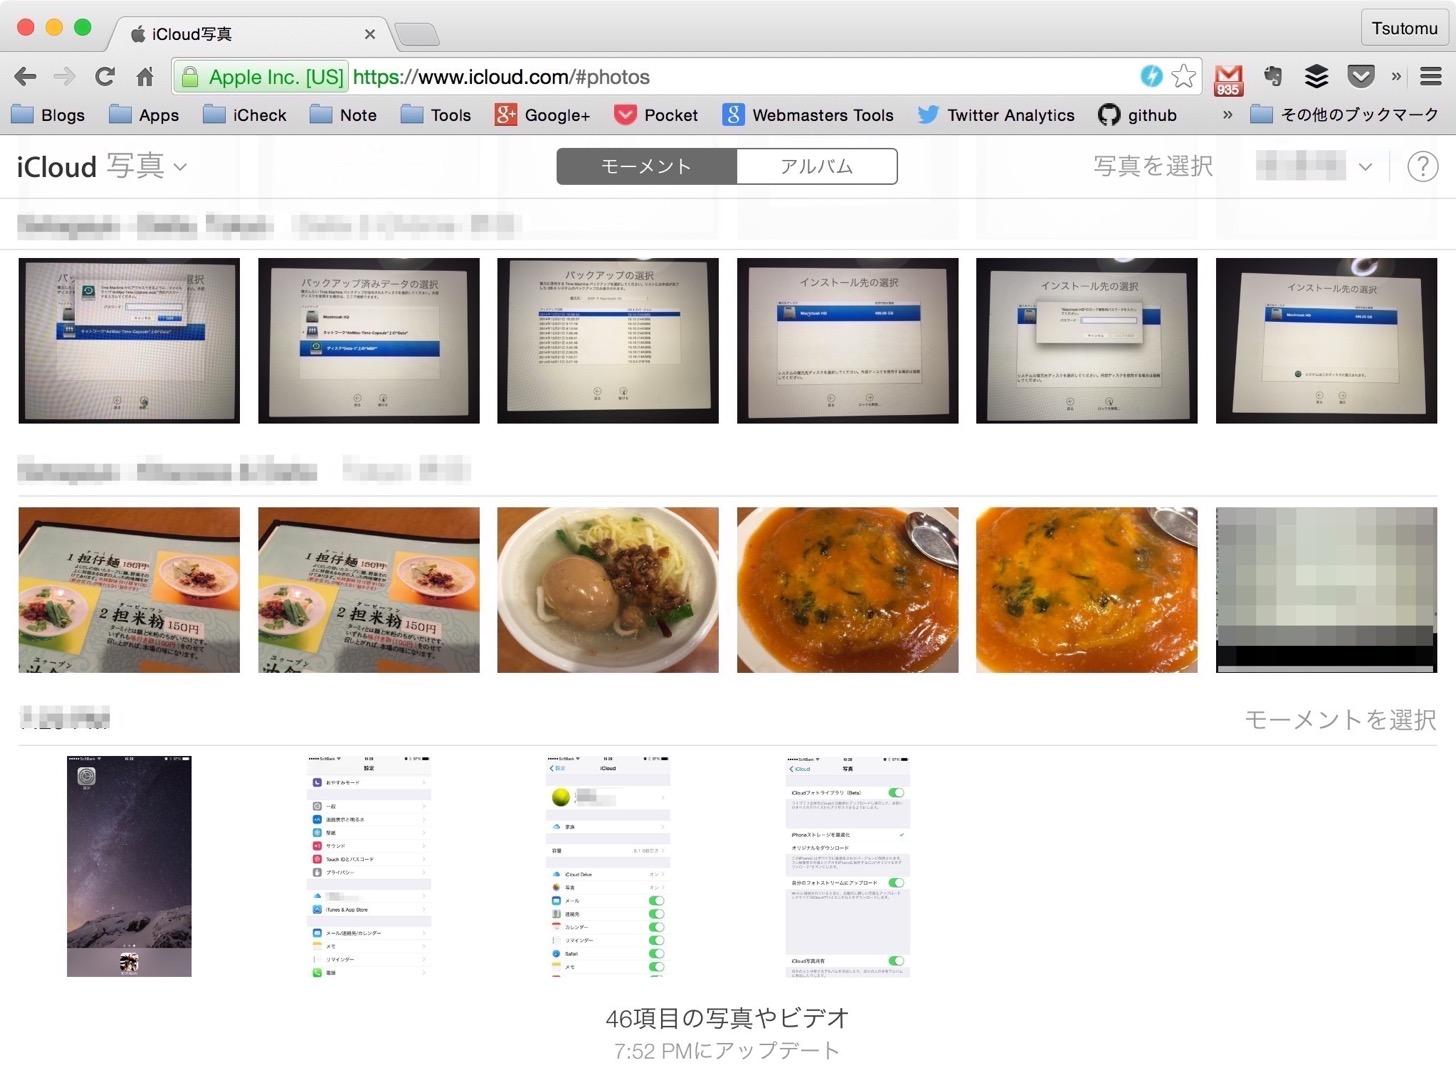 PC/MacからみたiCloud写真